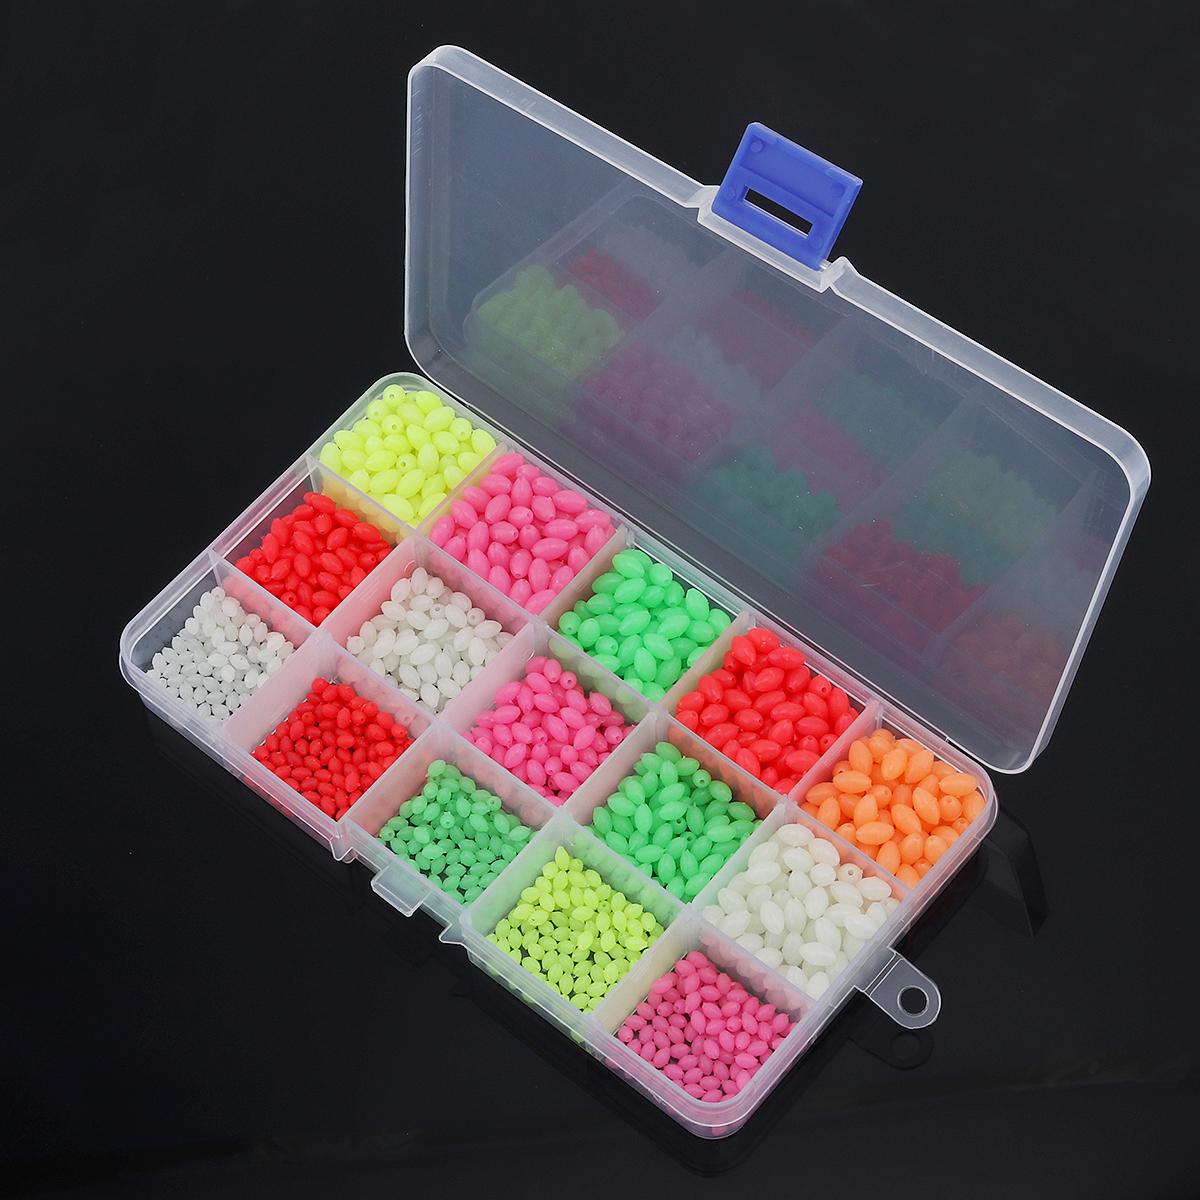 1500Pcs-Oval-Night-Luminous-Fishing-Beads-Sea-Fishing-Lure-Float-Tackle-Stoppers thumbnail 5